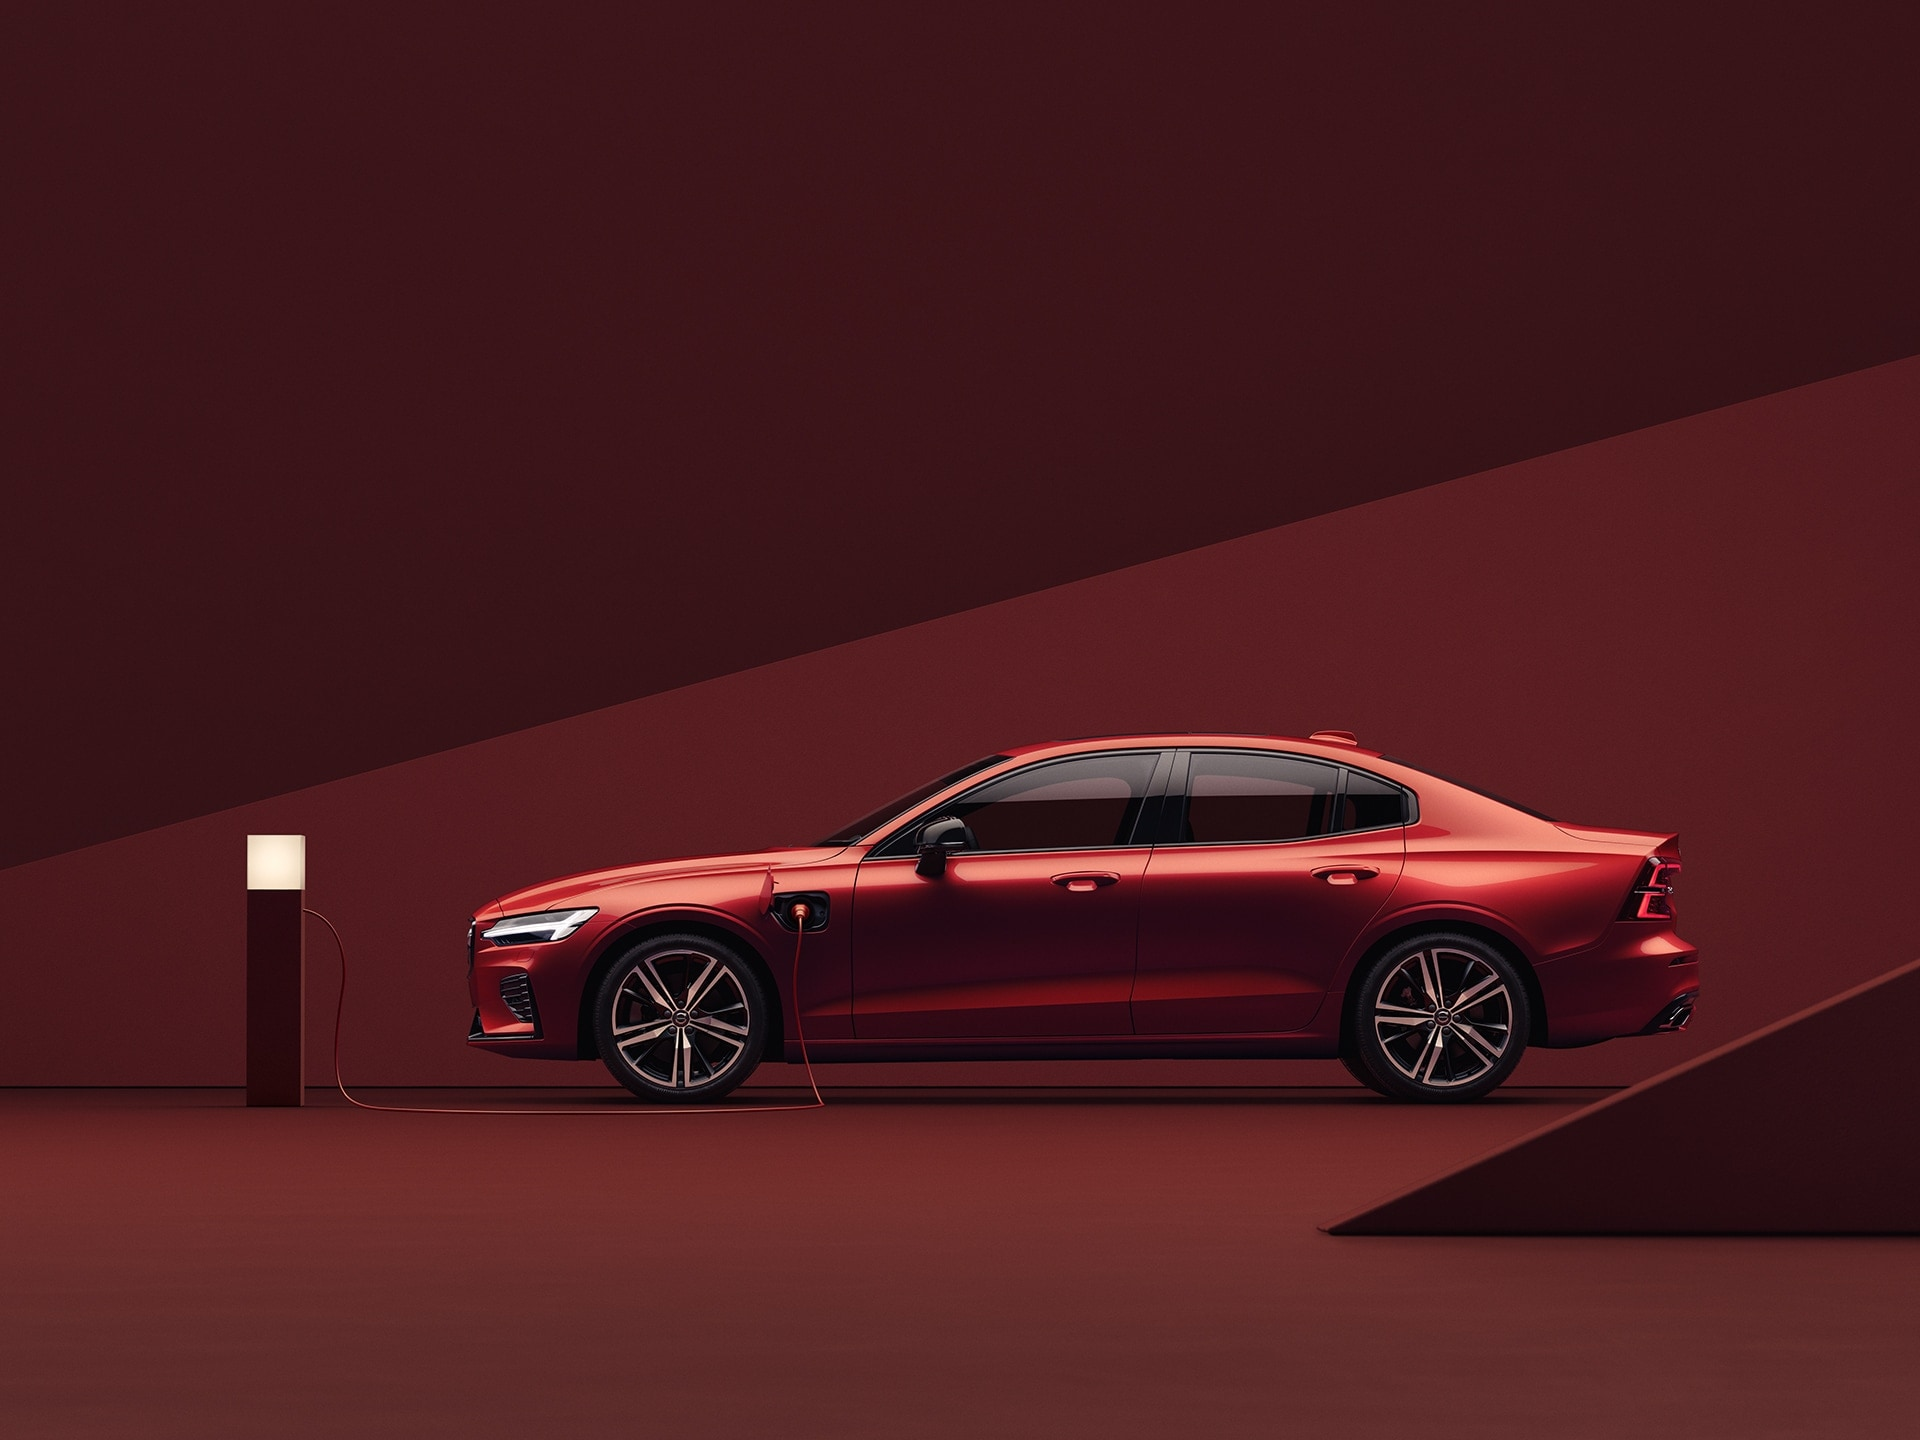 Petite berline sportive Volvo S60 Recharge rouge, en charge dans un environnement rouge.